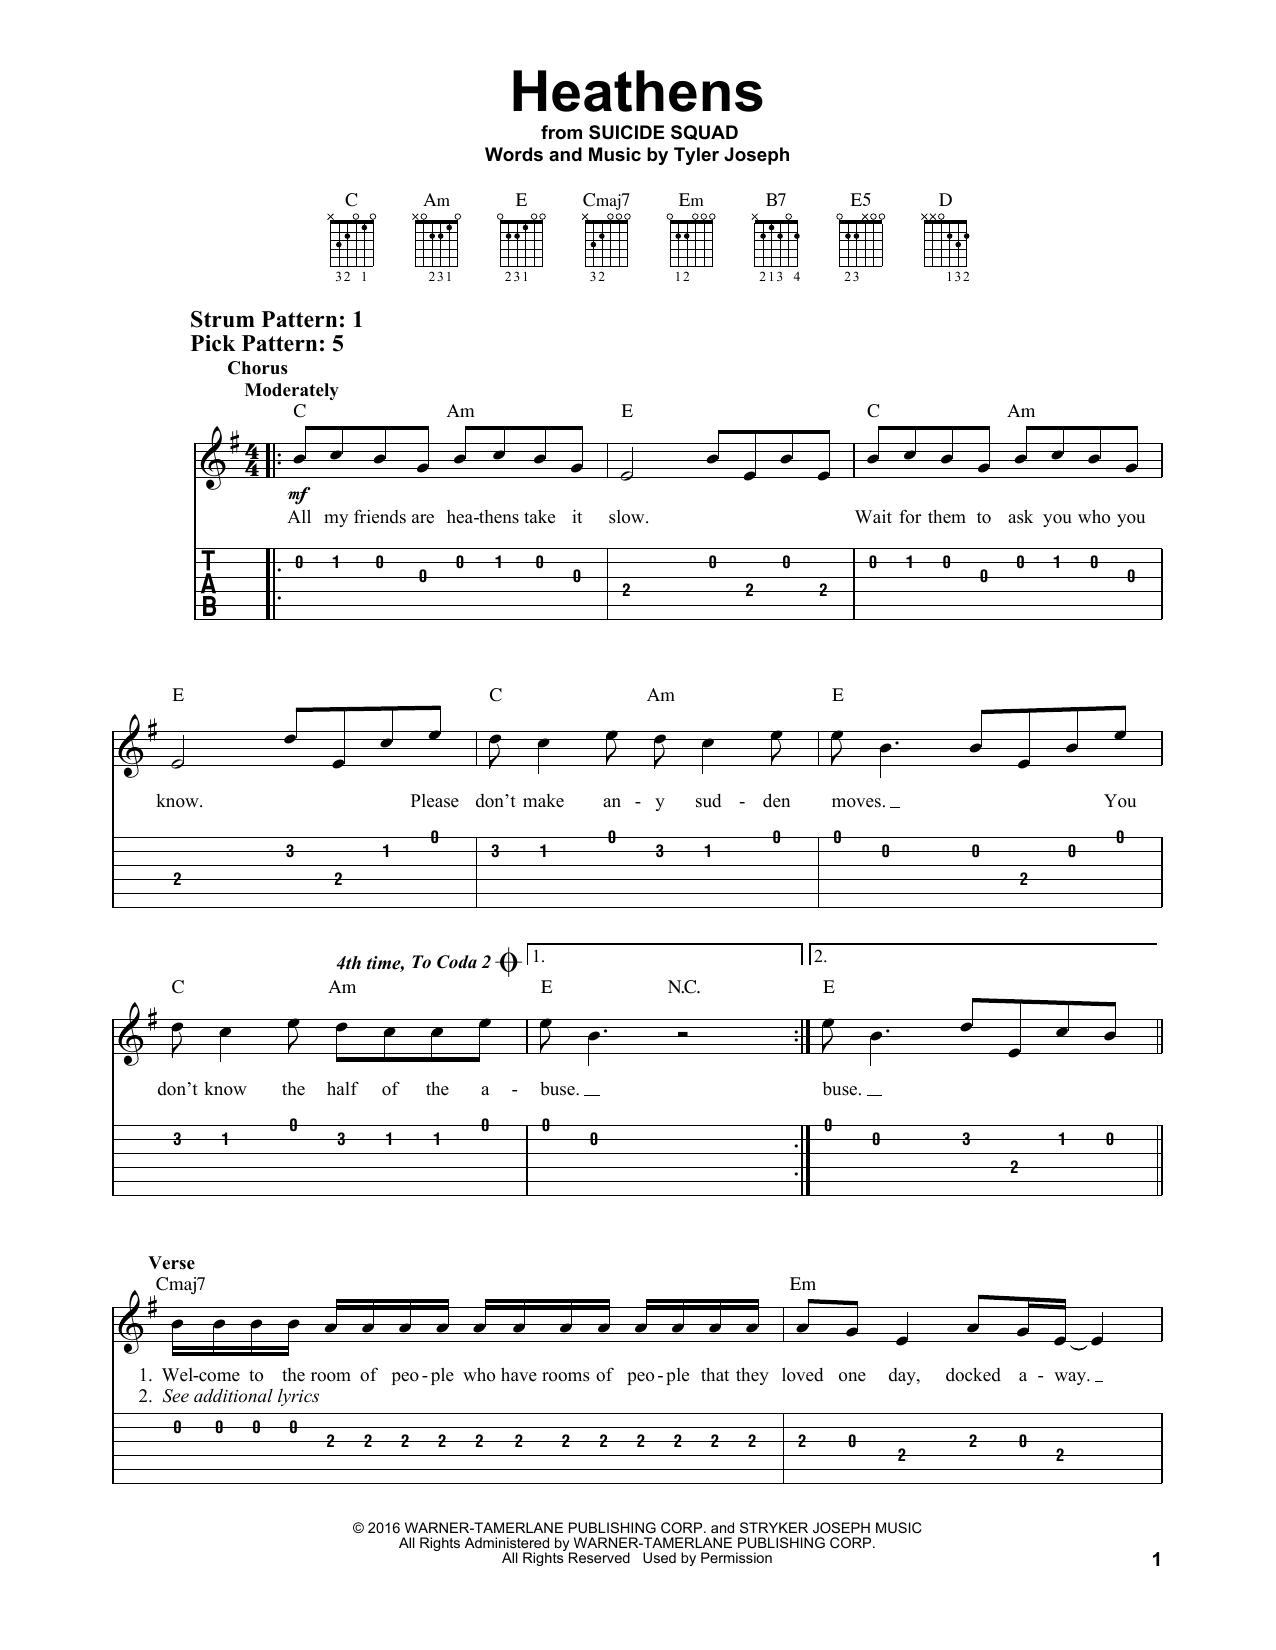 twenty one pilots Heathens sheet music notes and chords